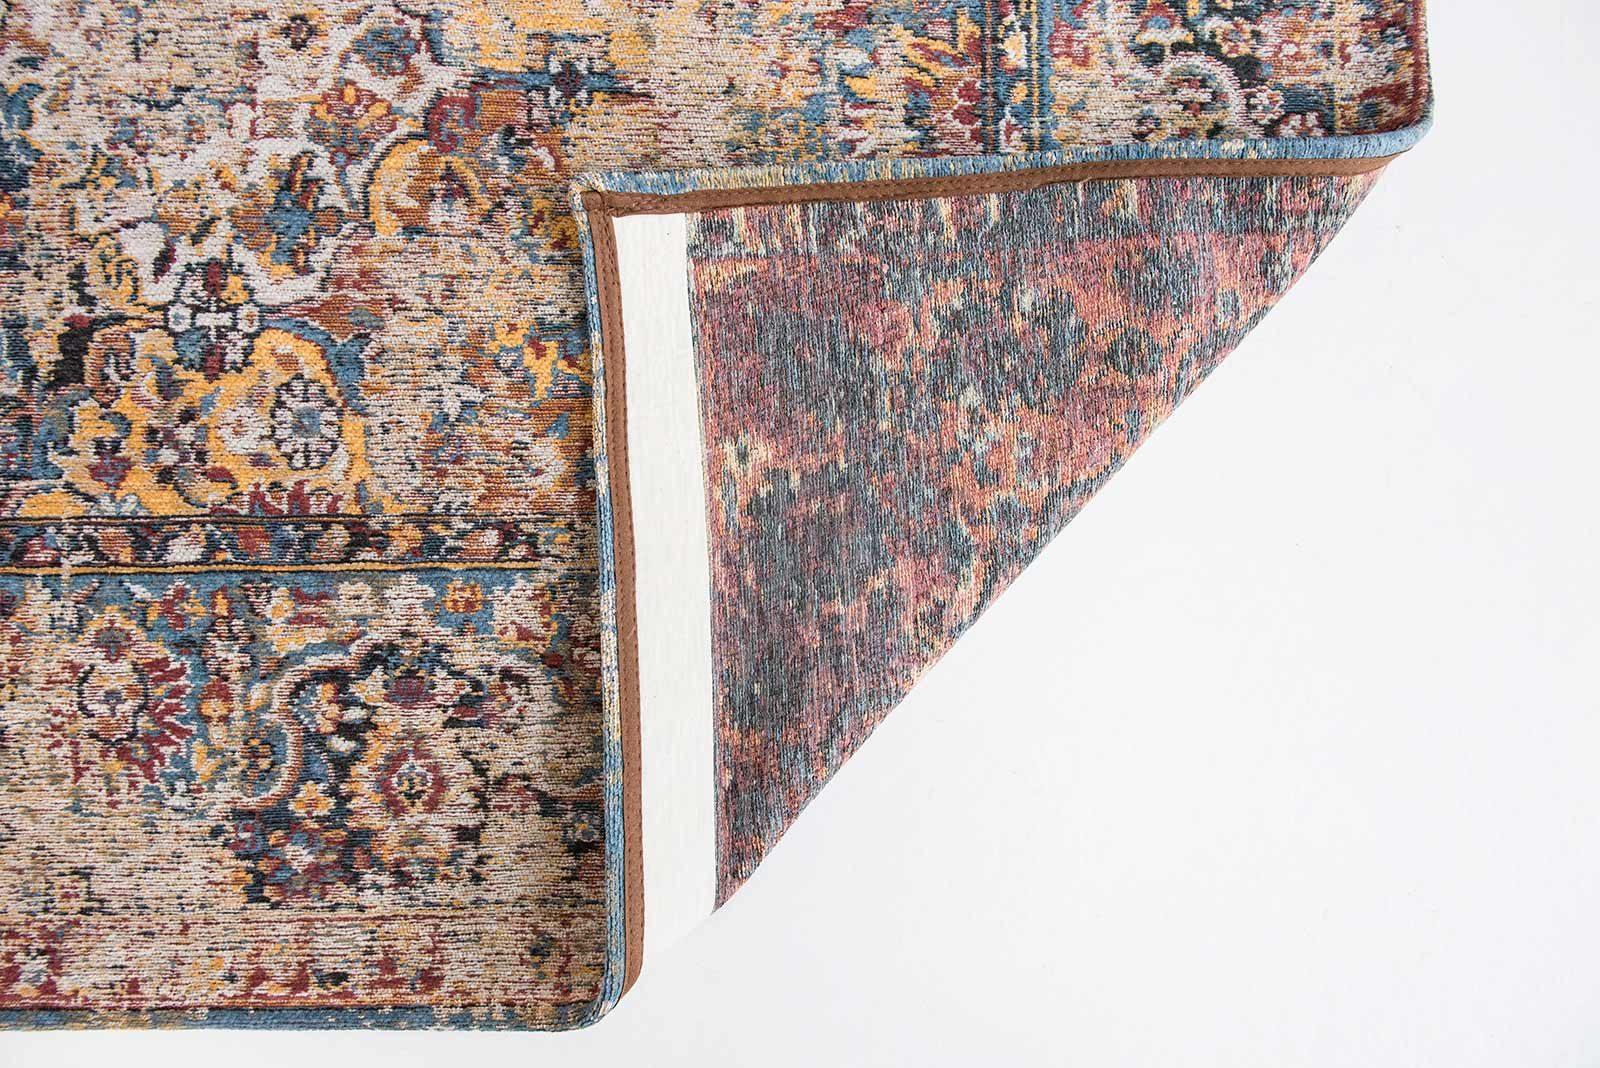 rugs Louis De Poortere LX8713 Antiquarian Antique Bakthiari Khedive Multi back